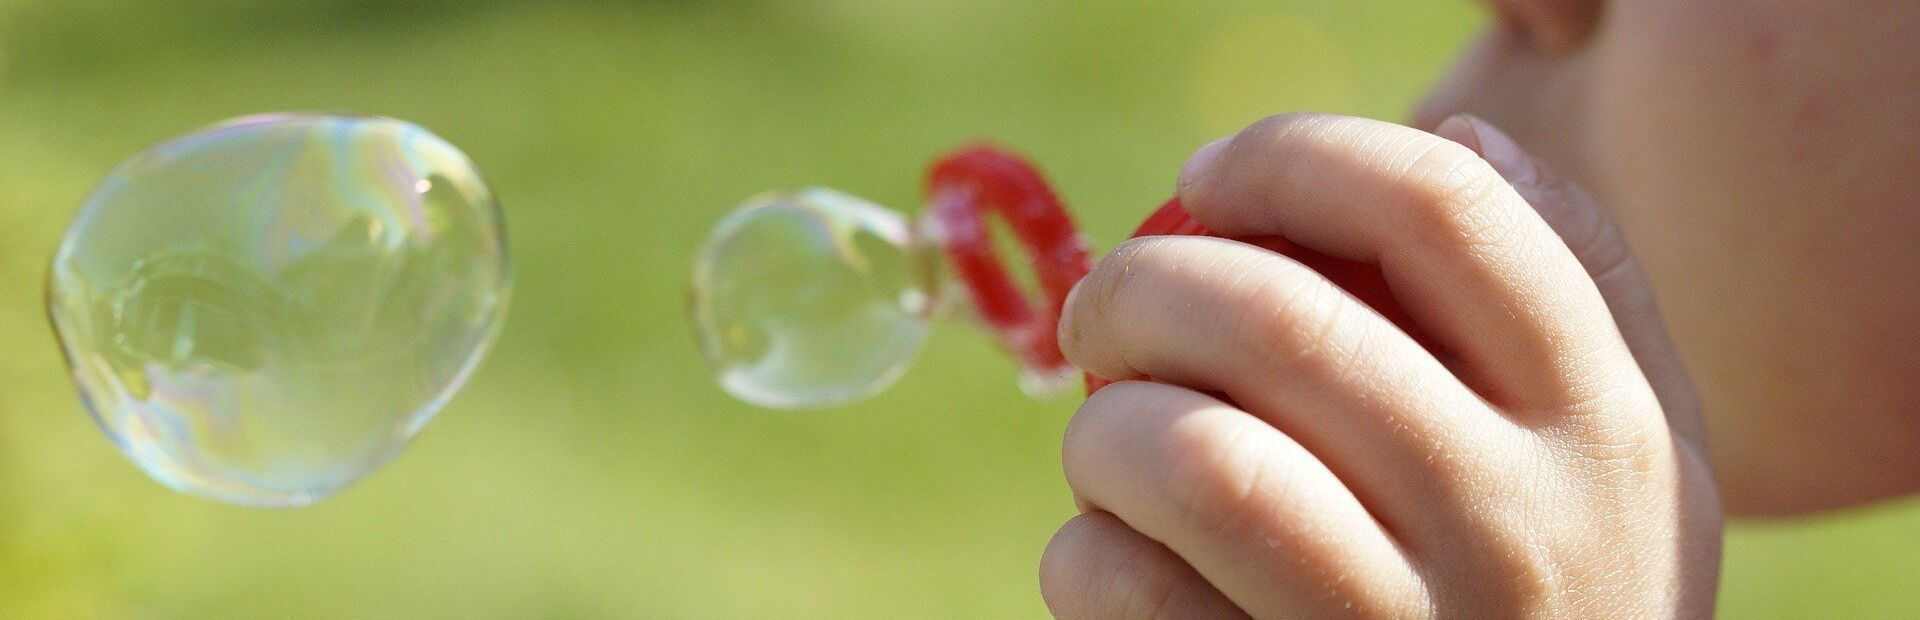 Foto-Kinder-Seifenblasen